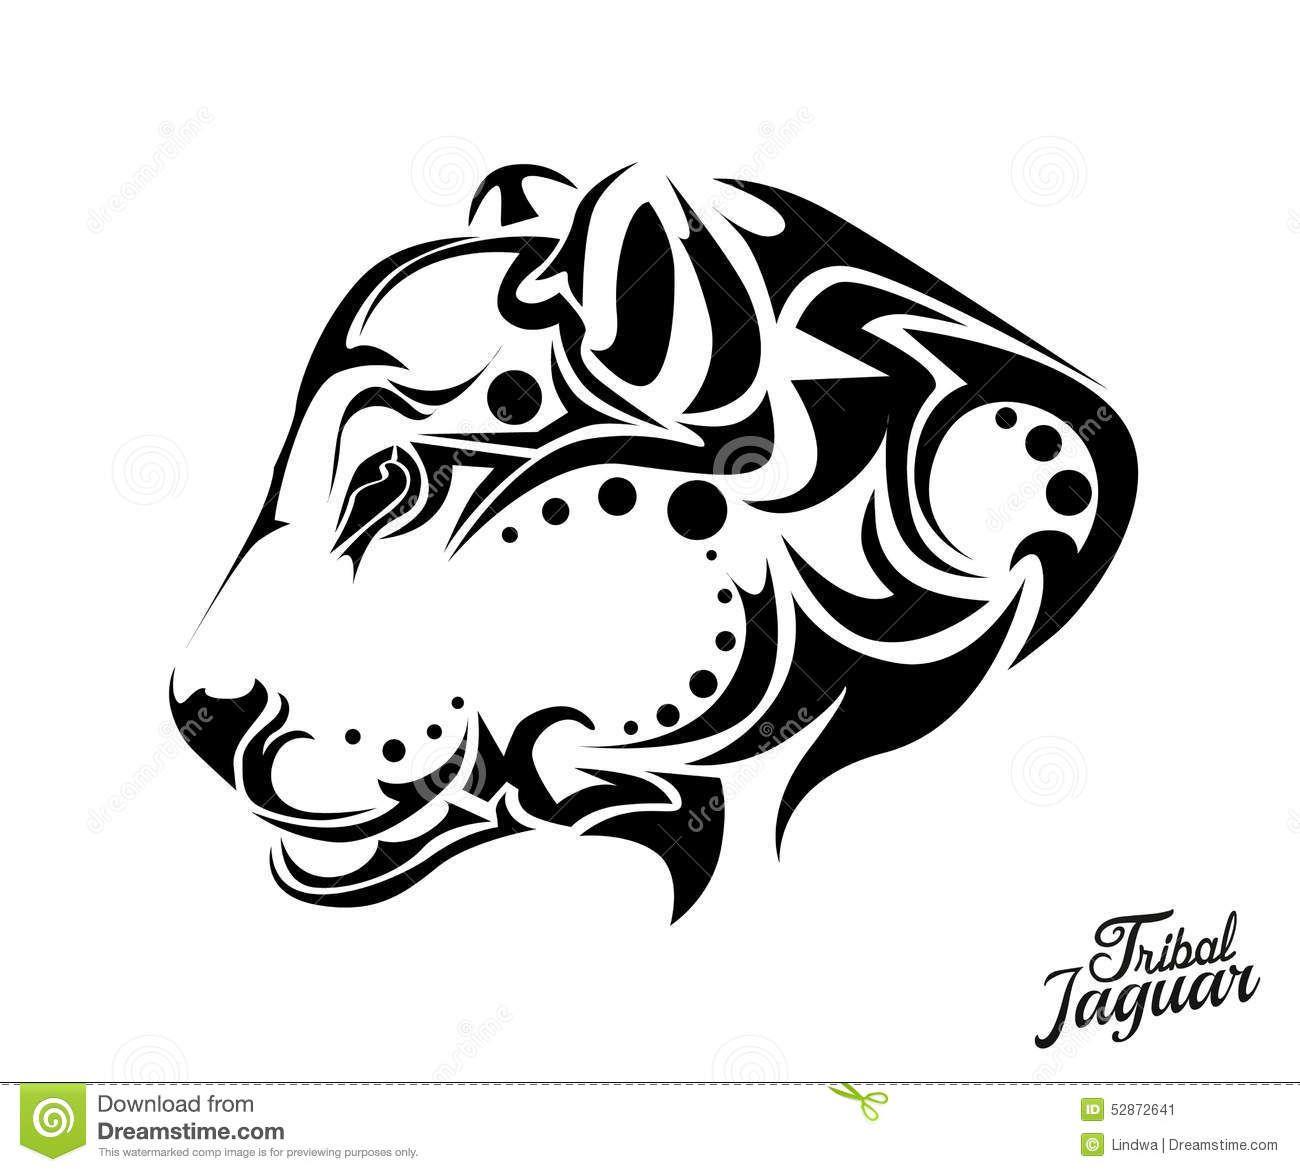 Tribal Jaguar Tattoo Vector Illustration Background